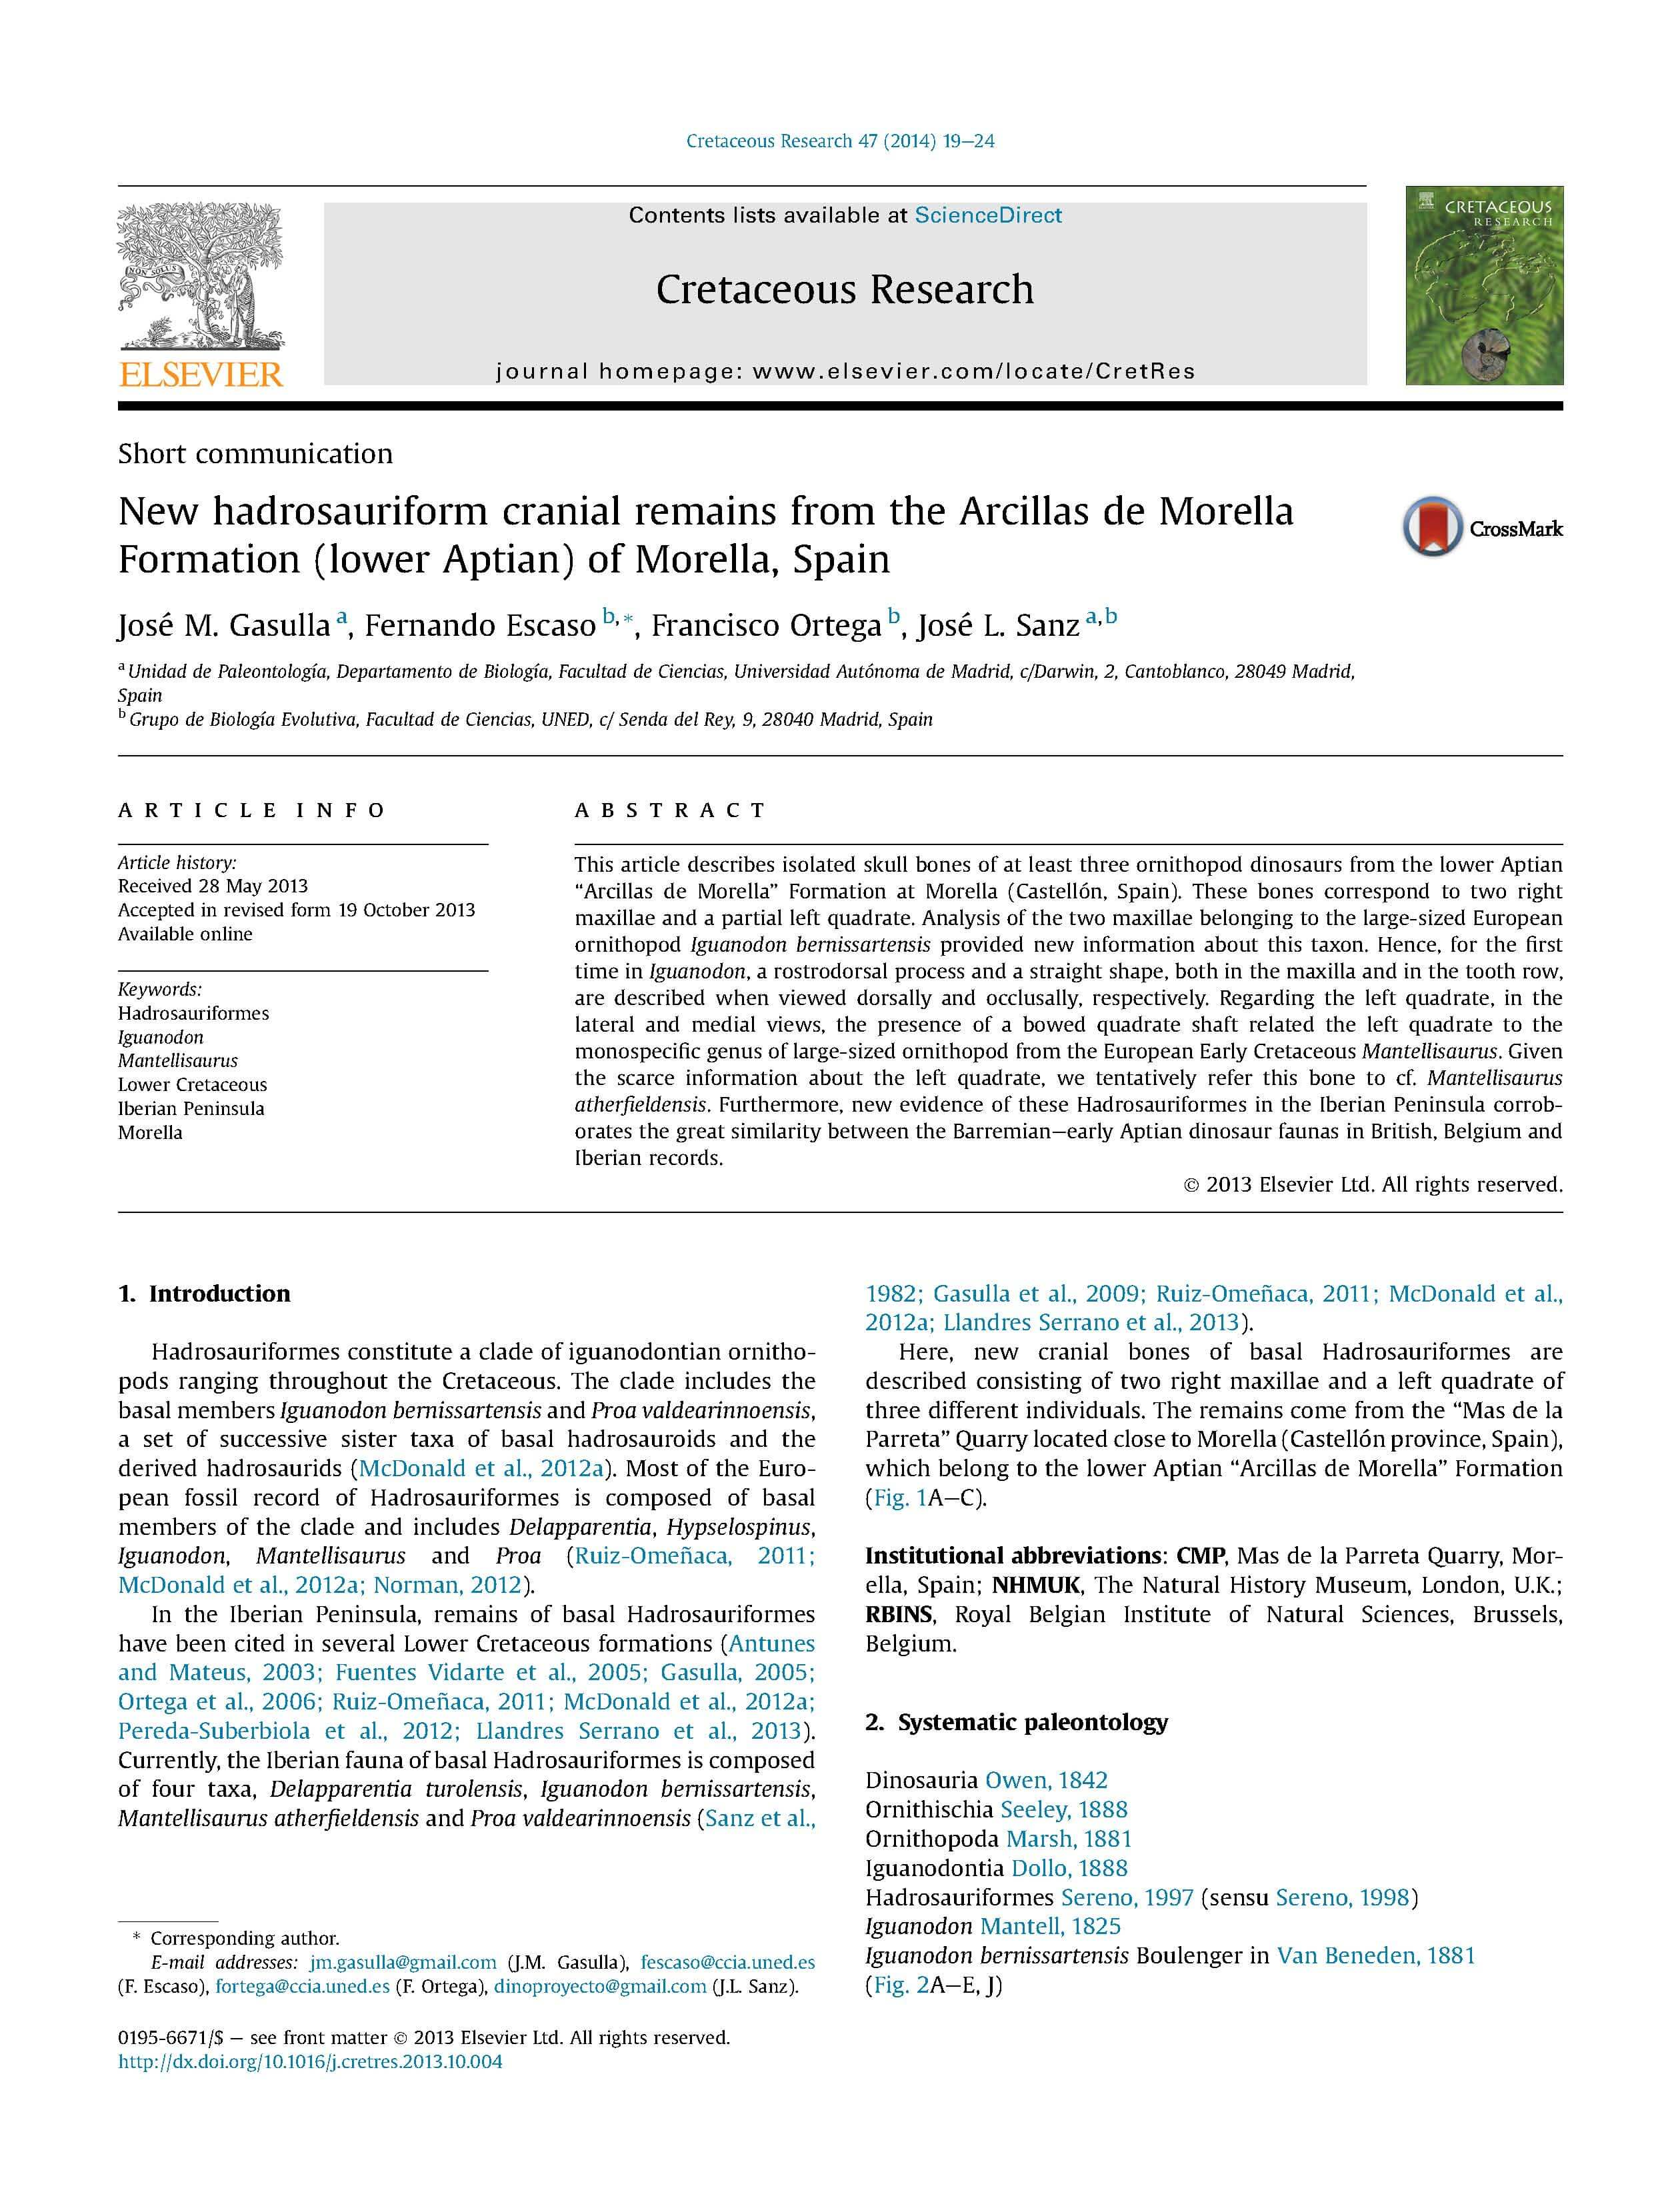 Gasulla et al 2014 Cretaceus Research